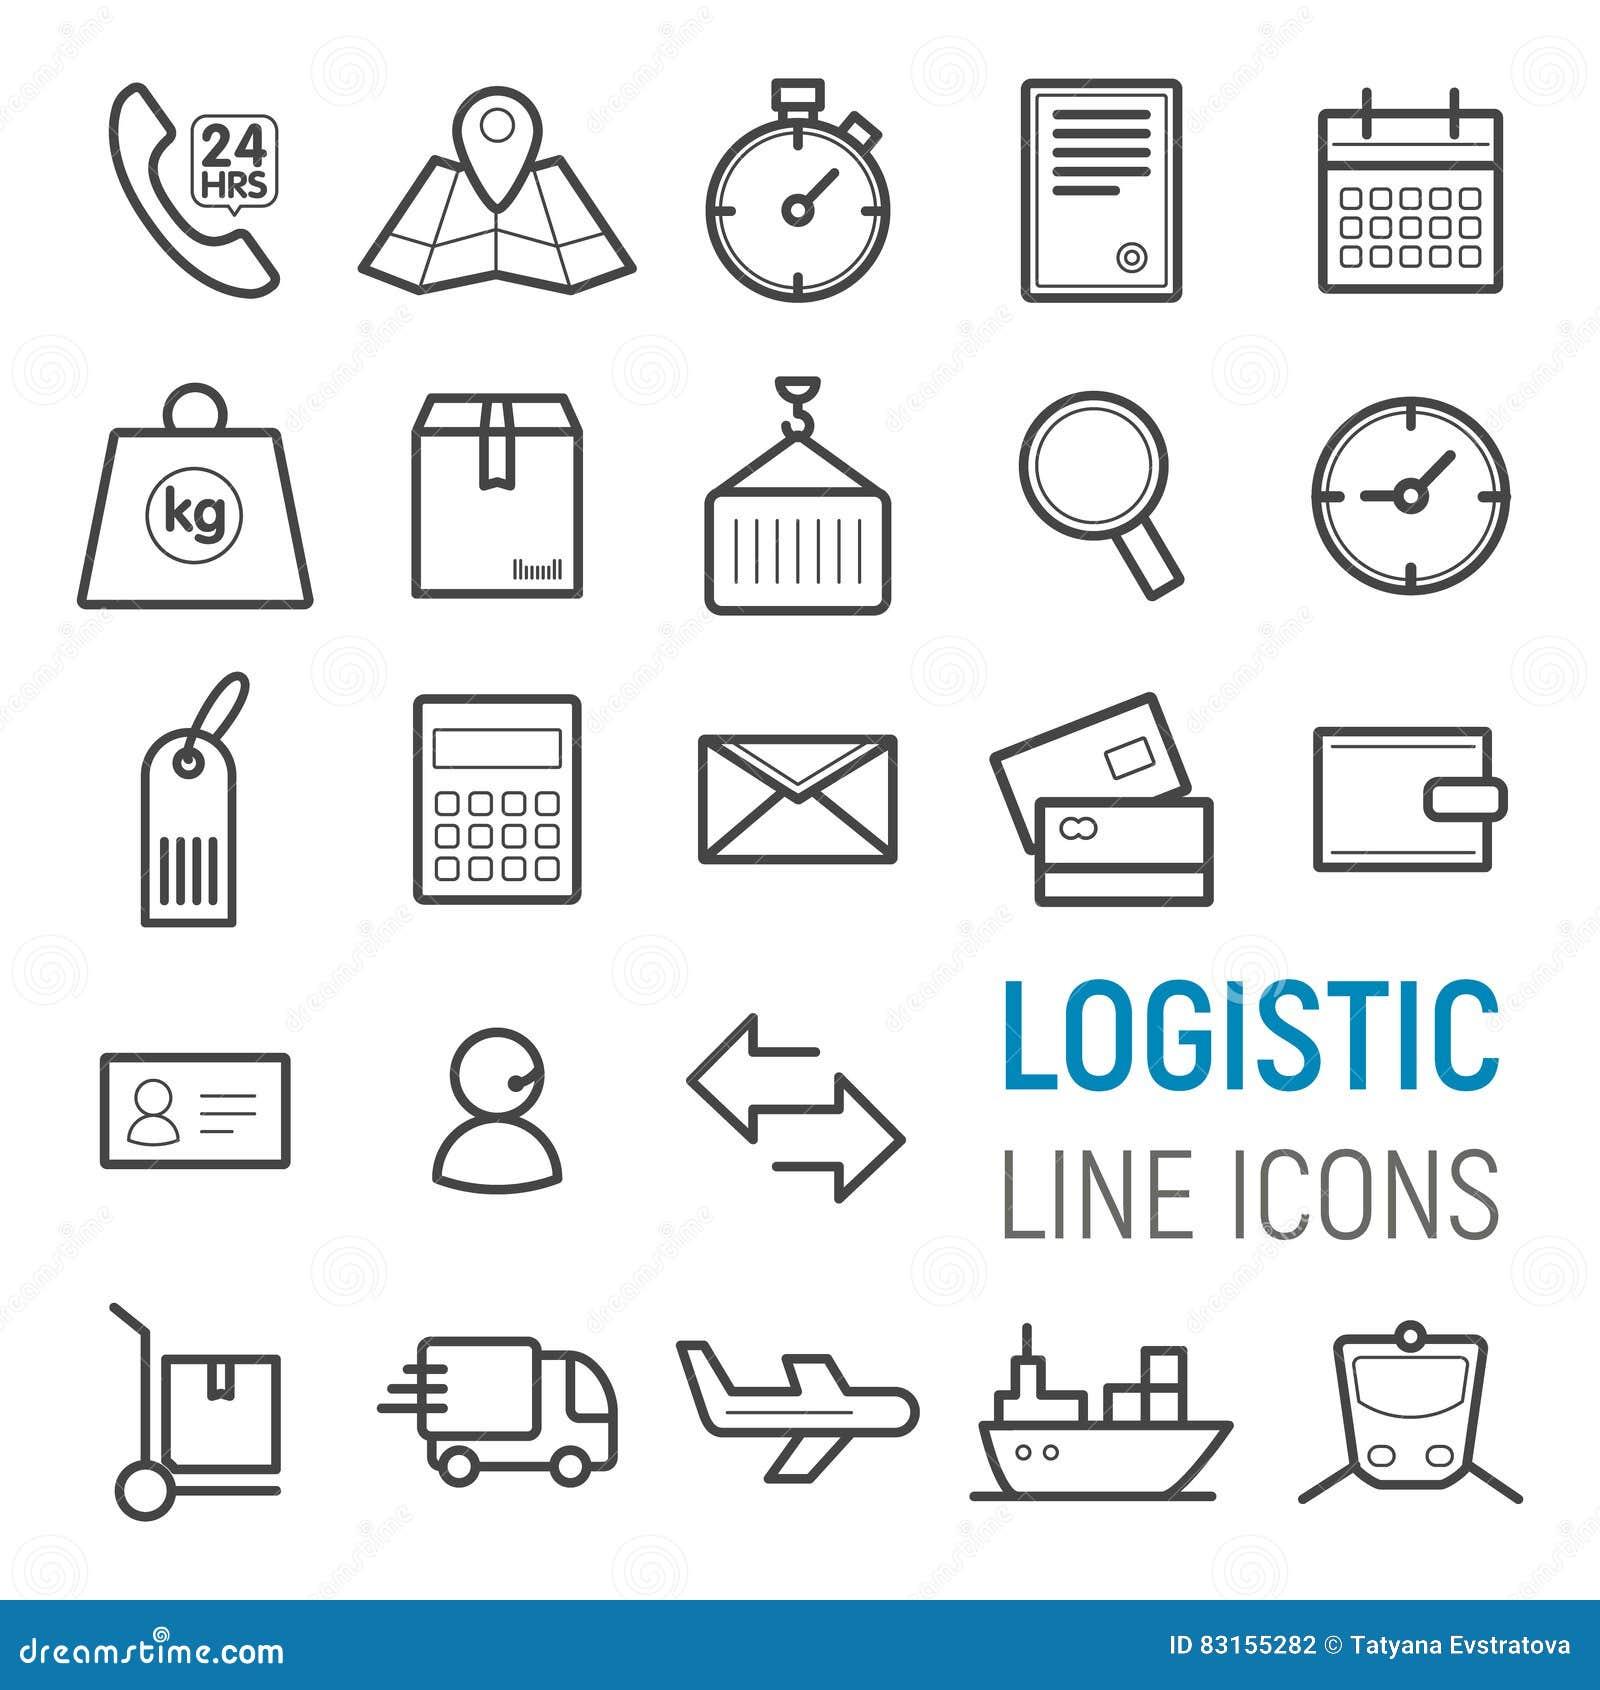 Logistic icons set. Vector flat line illustrations